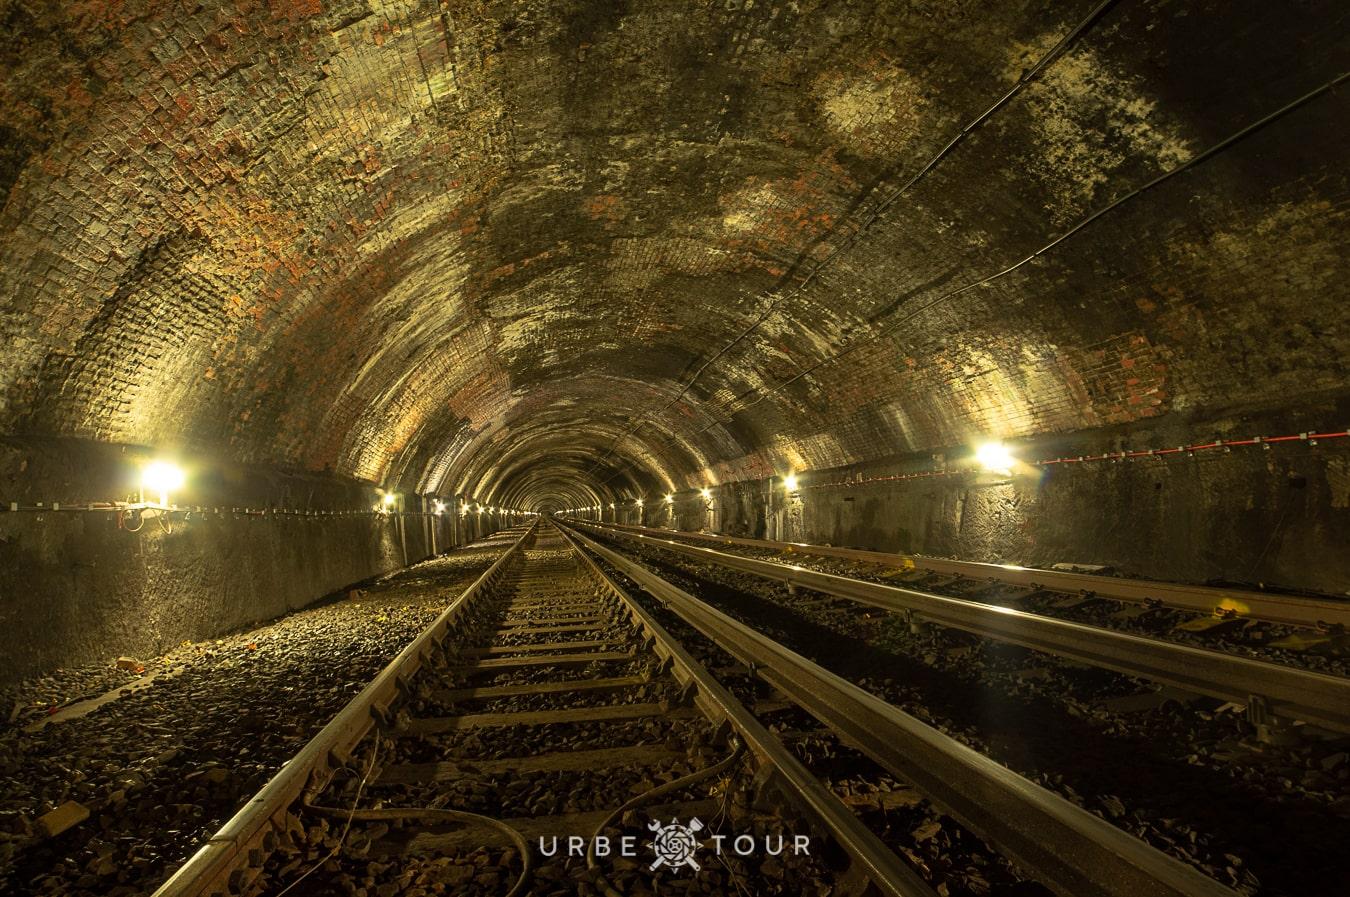 historycal tunnel of liverpool metro